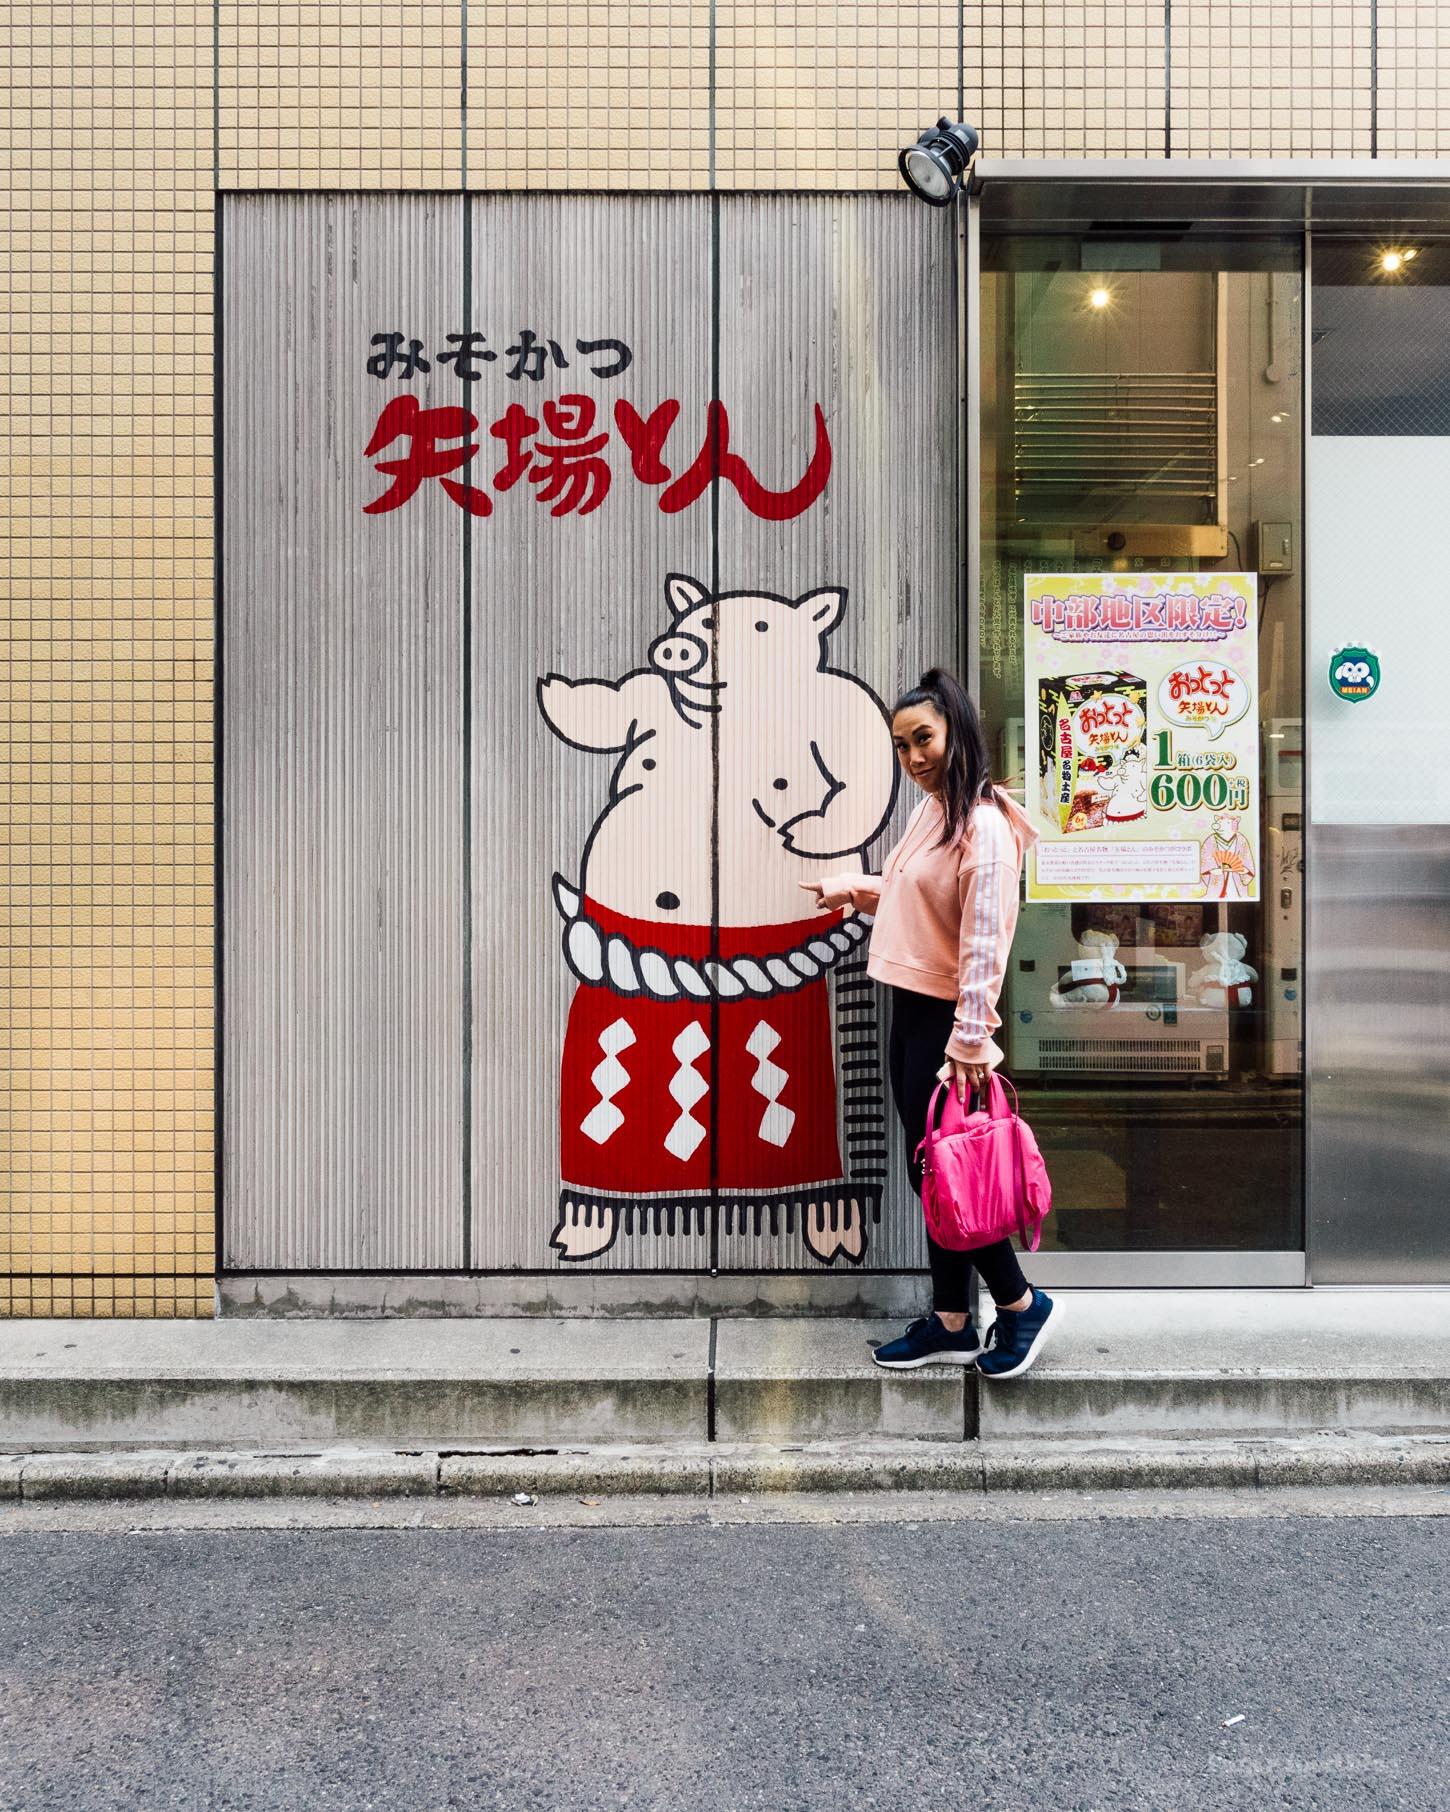 "<img src=""https://iamafoodblog.com/wp-content/uploads/2019/05/IAM_1132.jpg"" alt=""24 Hours in Nagoya, Japan | www.iamafoodblog.com"" width=""1450"" height=""1812"" class=""alignnone size-full wp-image-27829"" />"